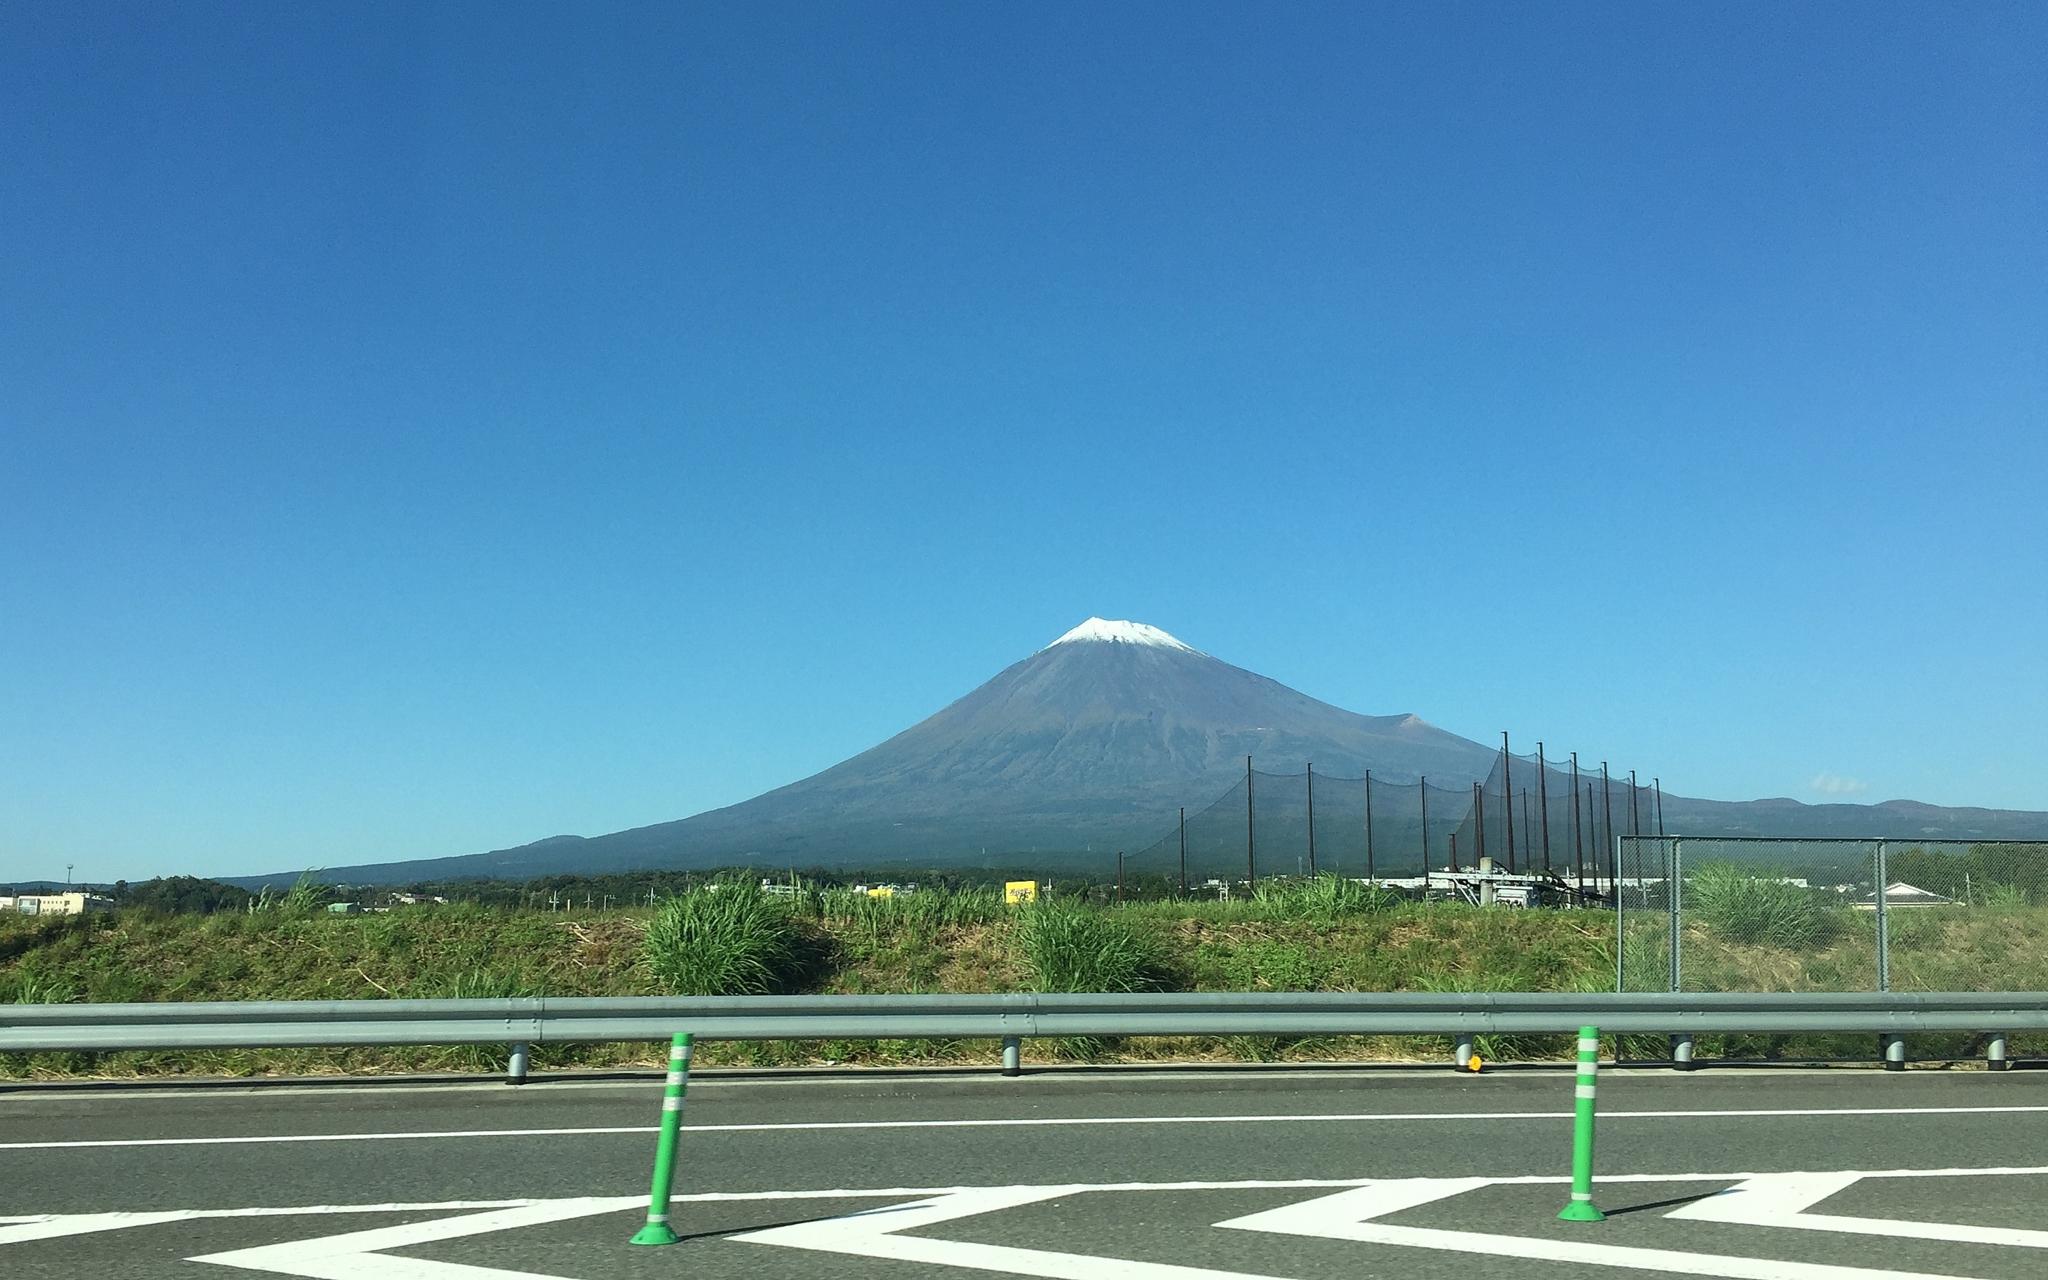 f:id:ToshUeno:20151012145310j:plain